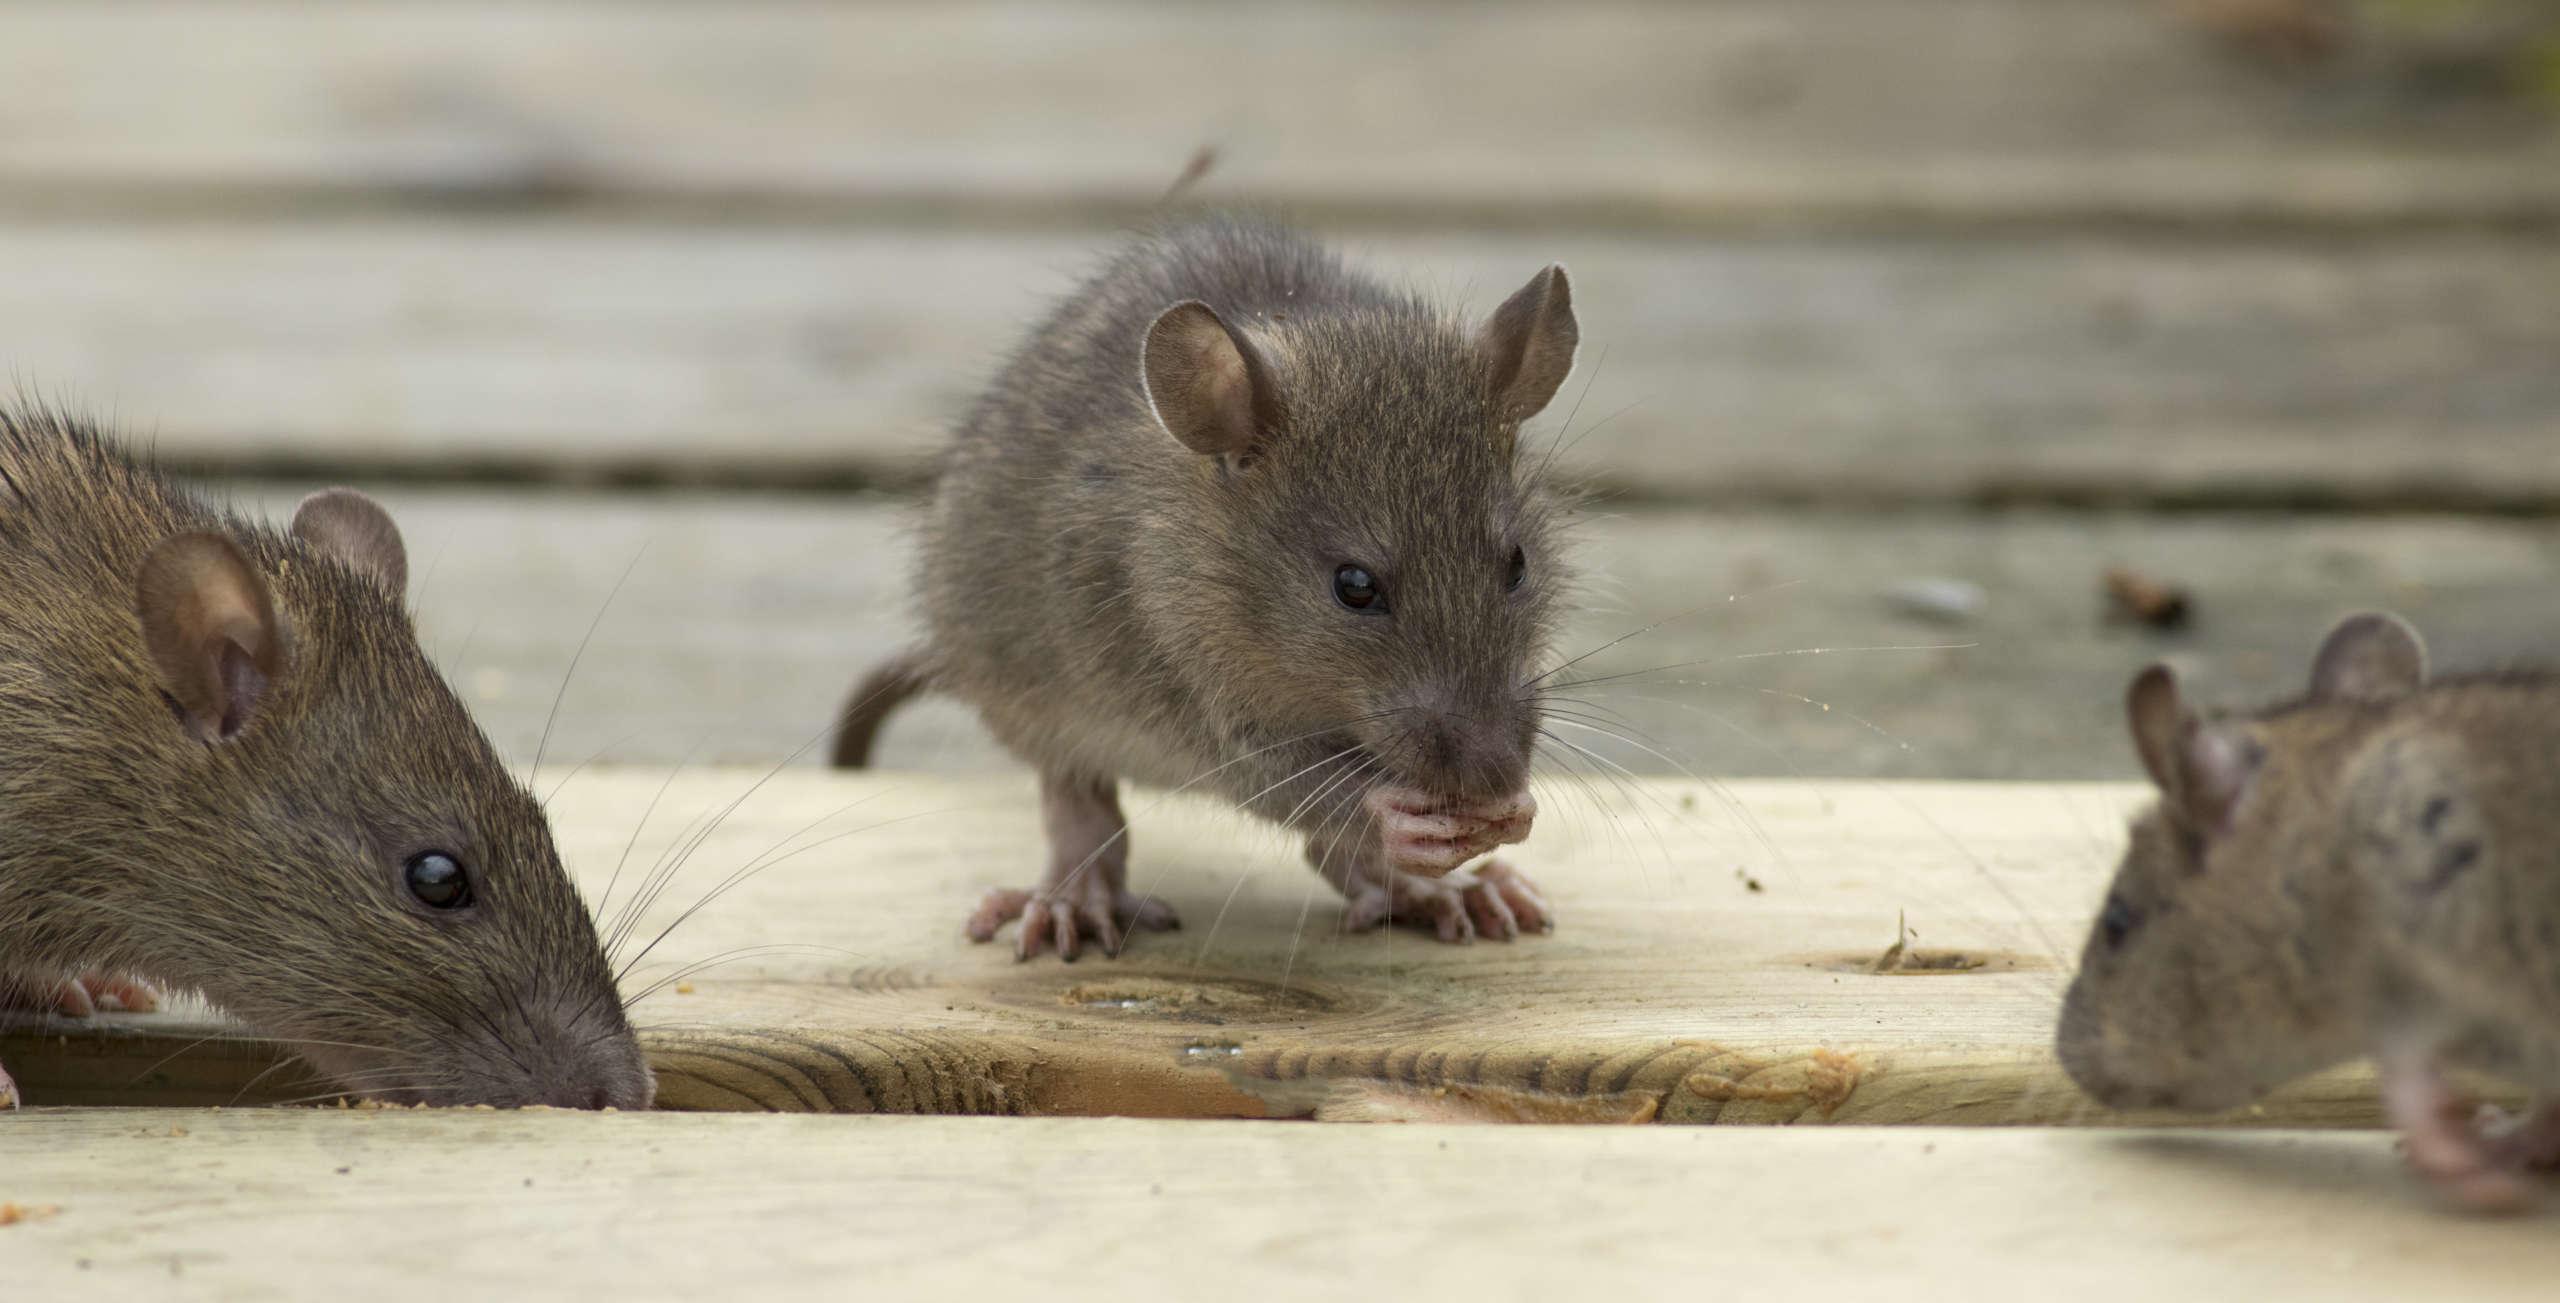 Rat brun Nuisibles du Nord